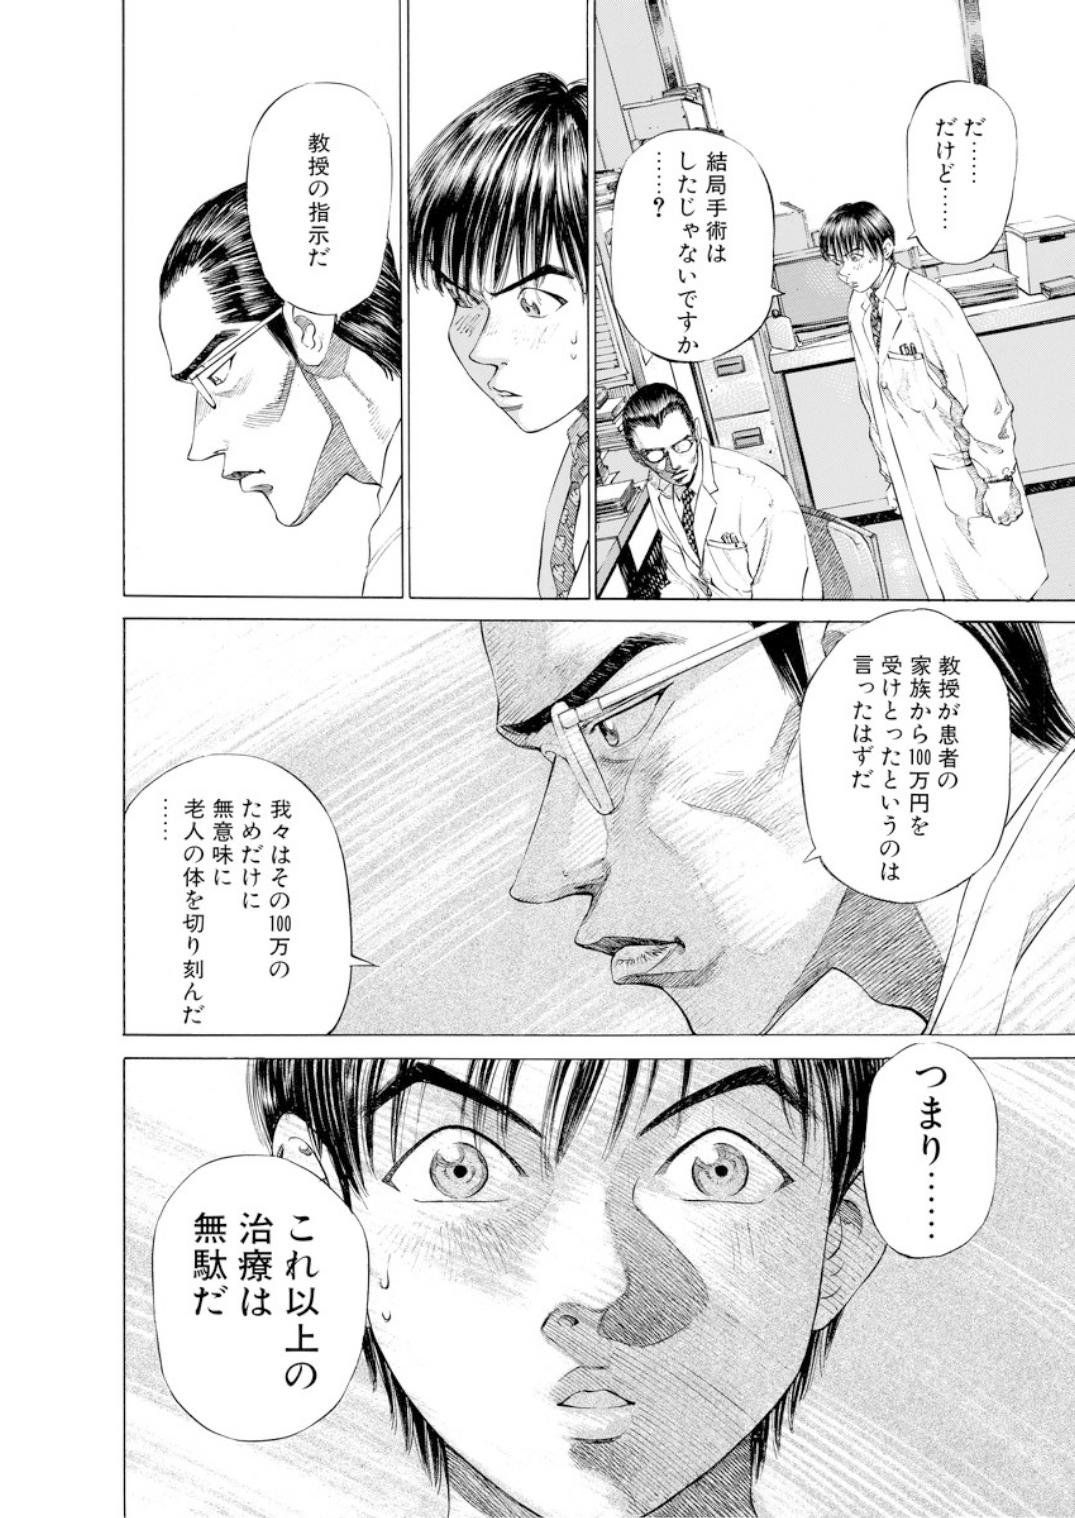 001bj_page-0100.jpg